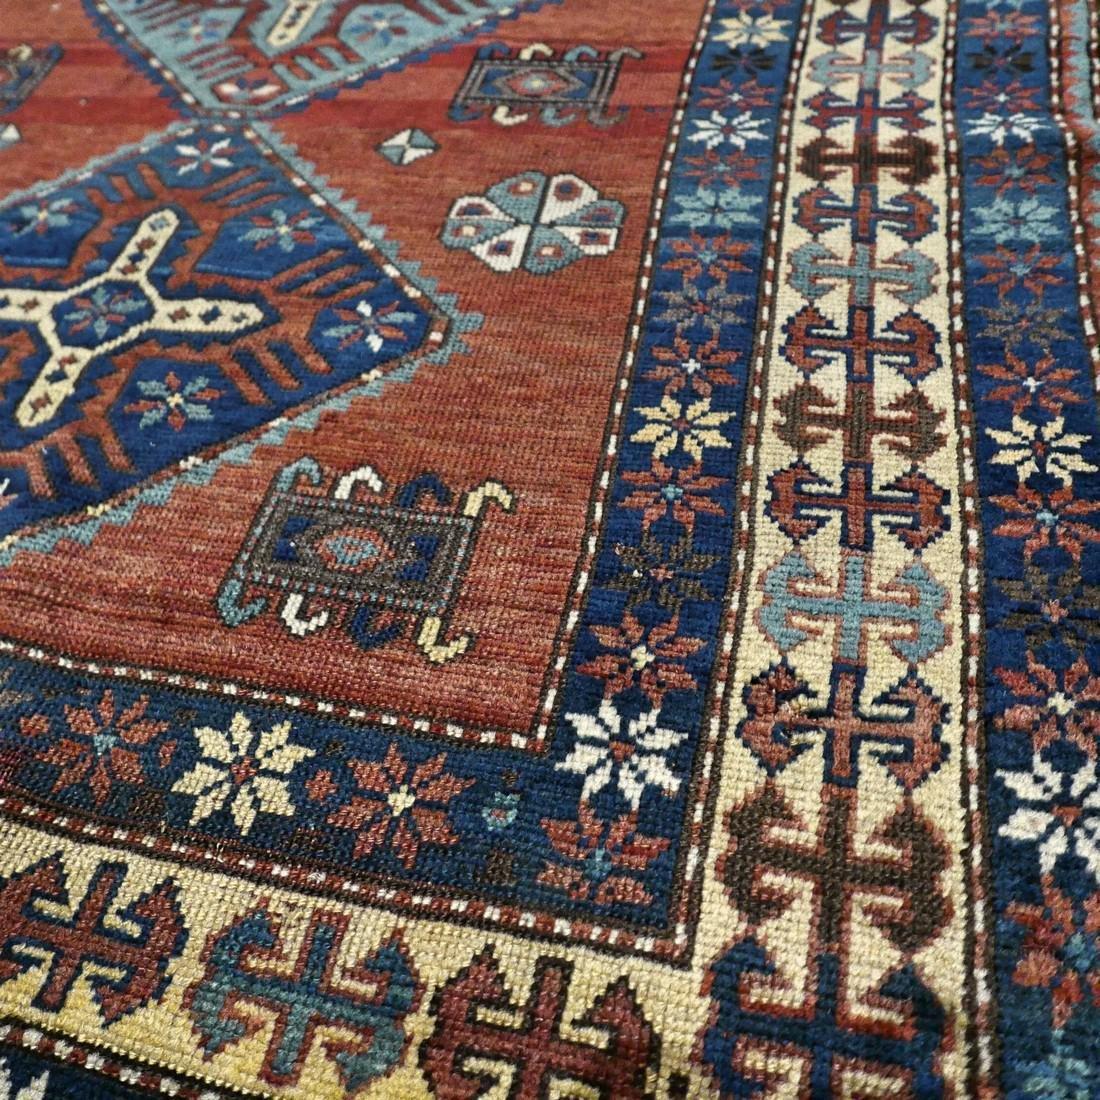 Wonderful antique 1940s Kazak rug6.1 x 4.4 - 3